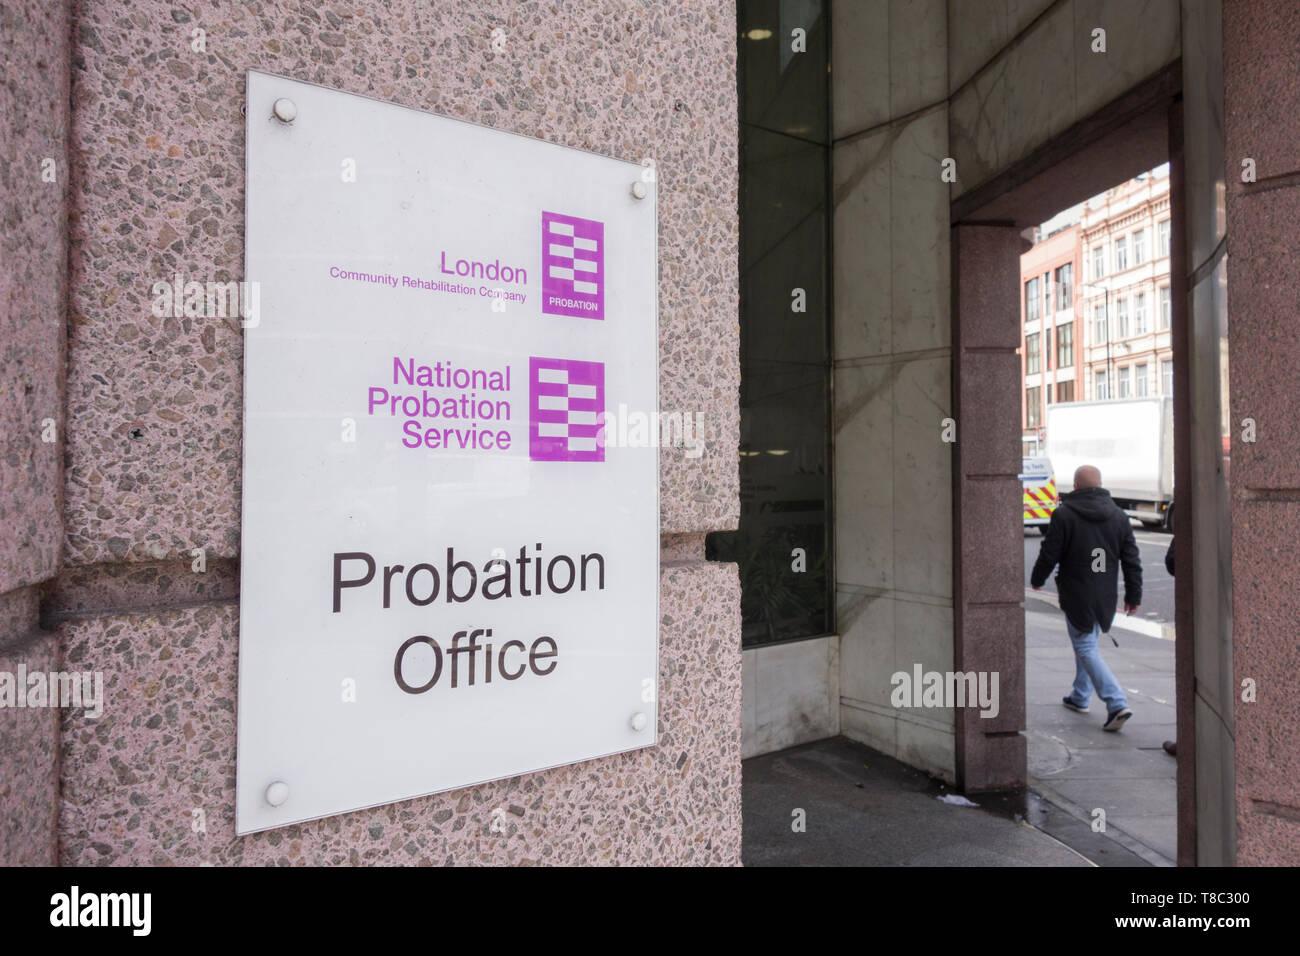 Signage outside the National Probation Service, Probation Office, Great Dover Street,  Southwark, London SE1, UK Stock Photo